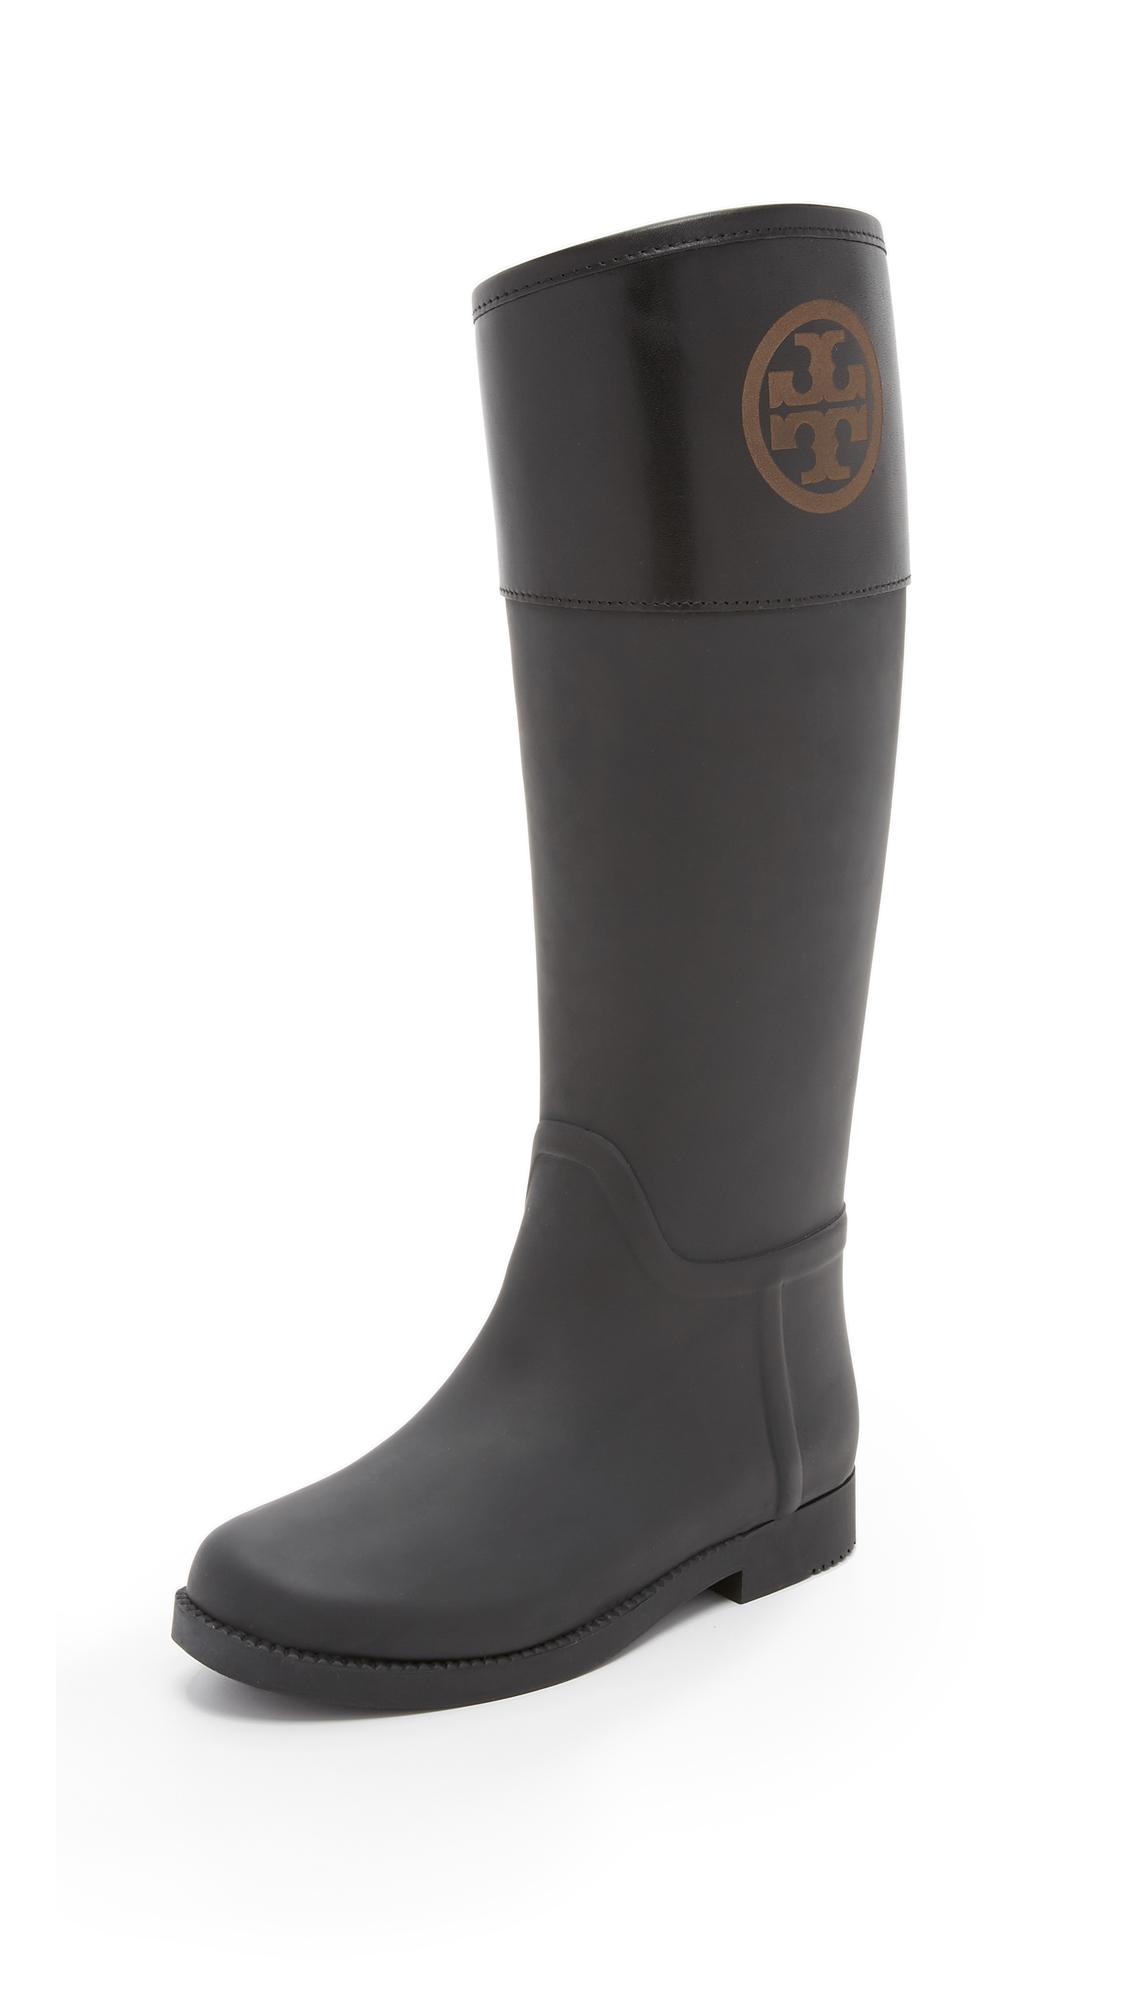 Tory burch Classic Rain Boots in Black | Lyst